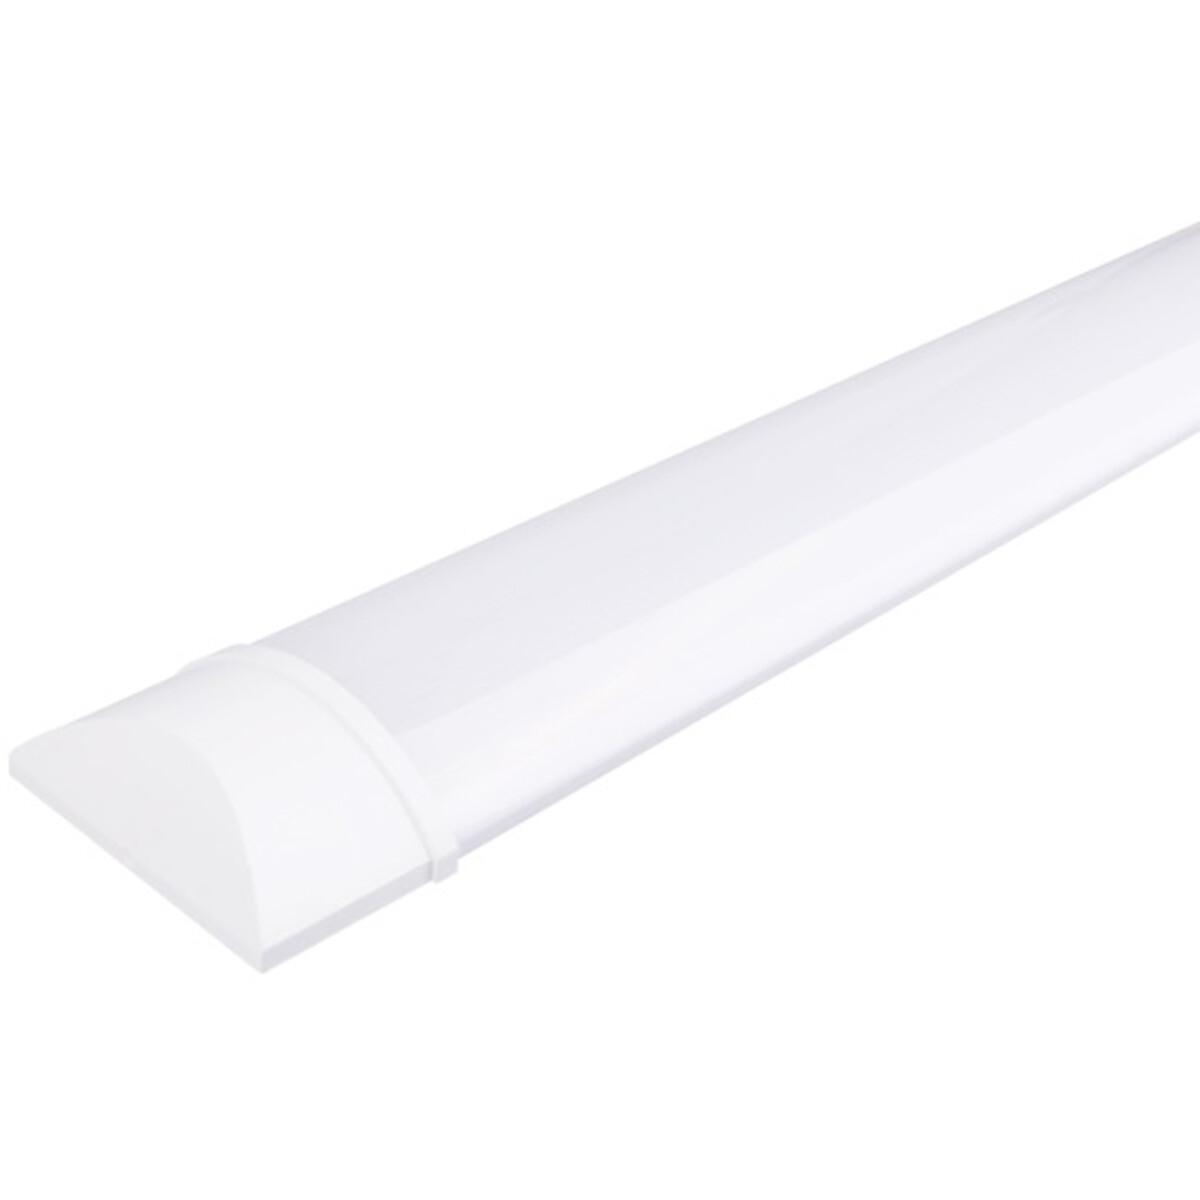 LED Balk - Aigi Tynom - 50W - Helder/Koud Wit 6000K - Mat Wit - Kunststof - 150cm